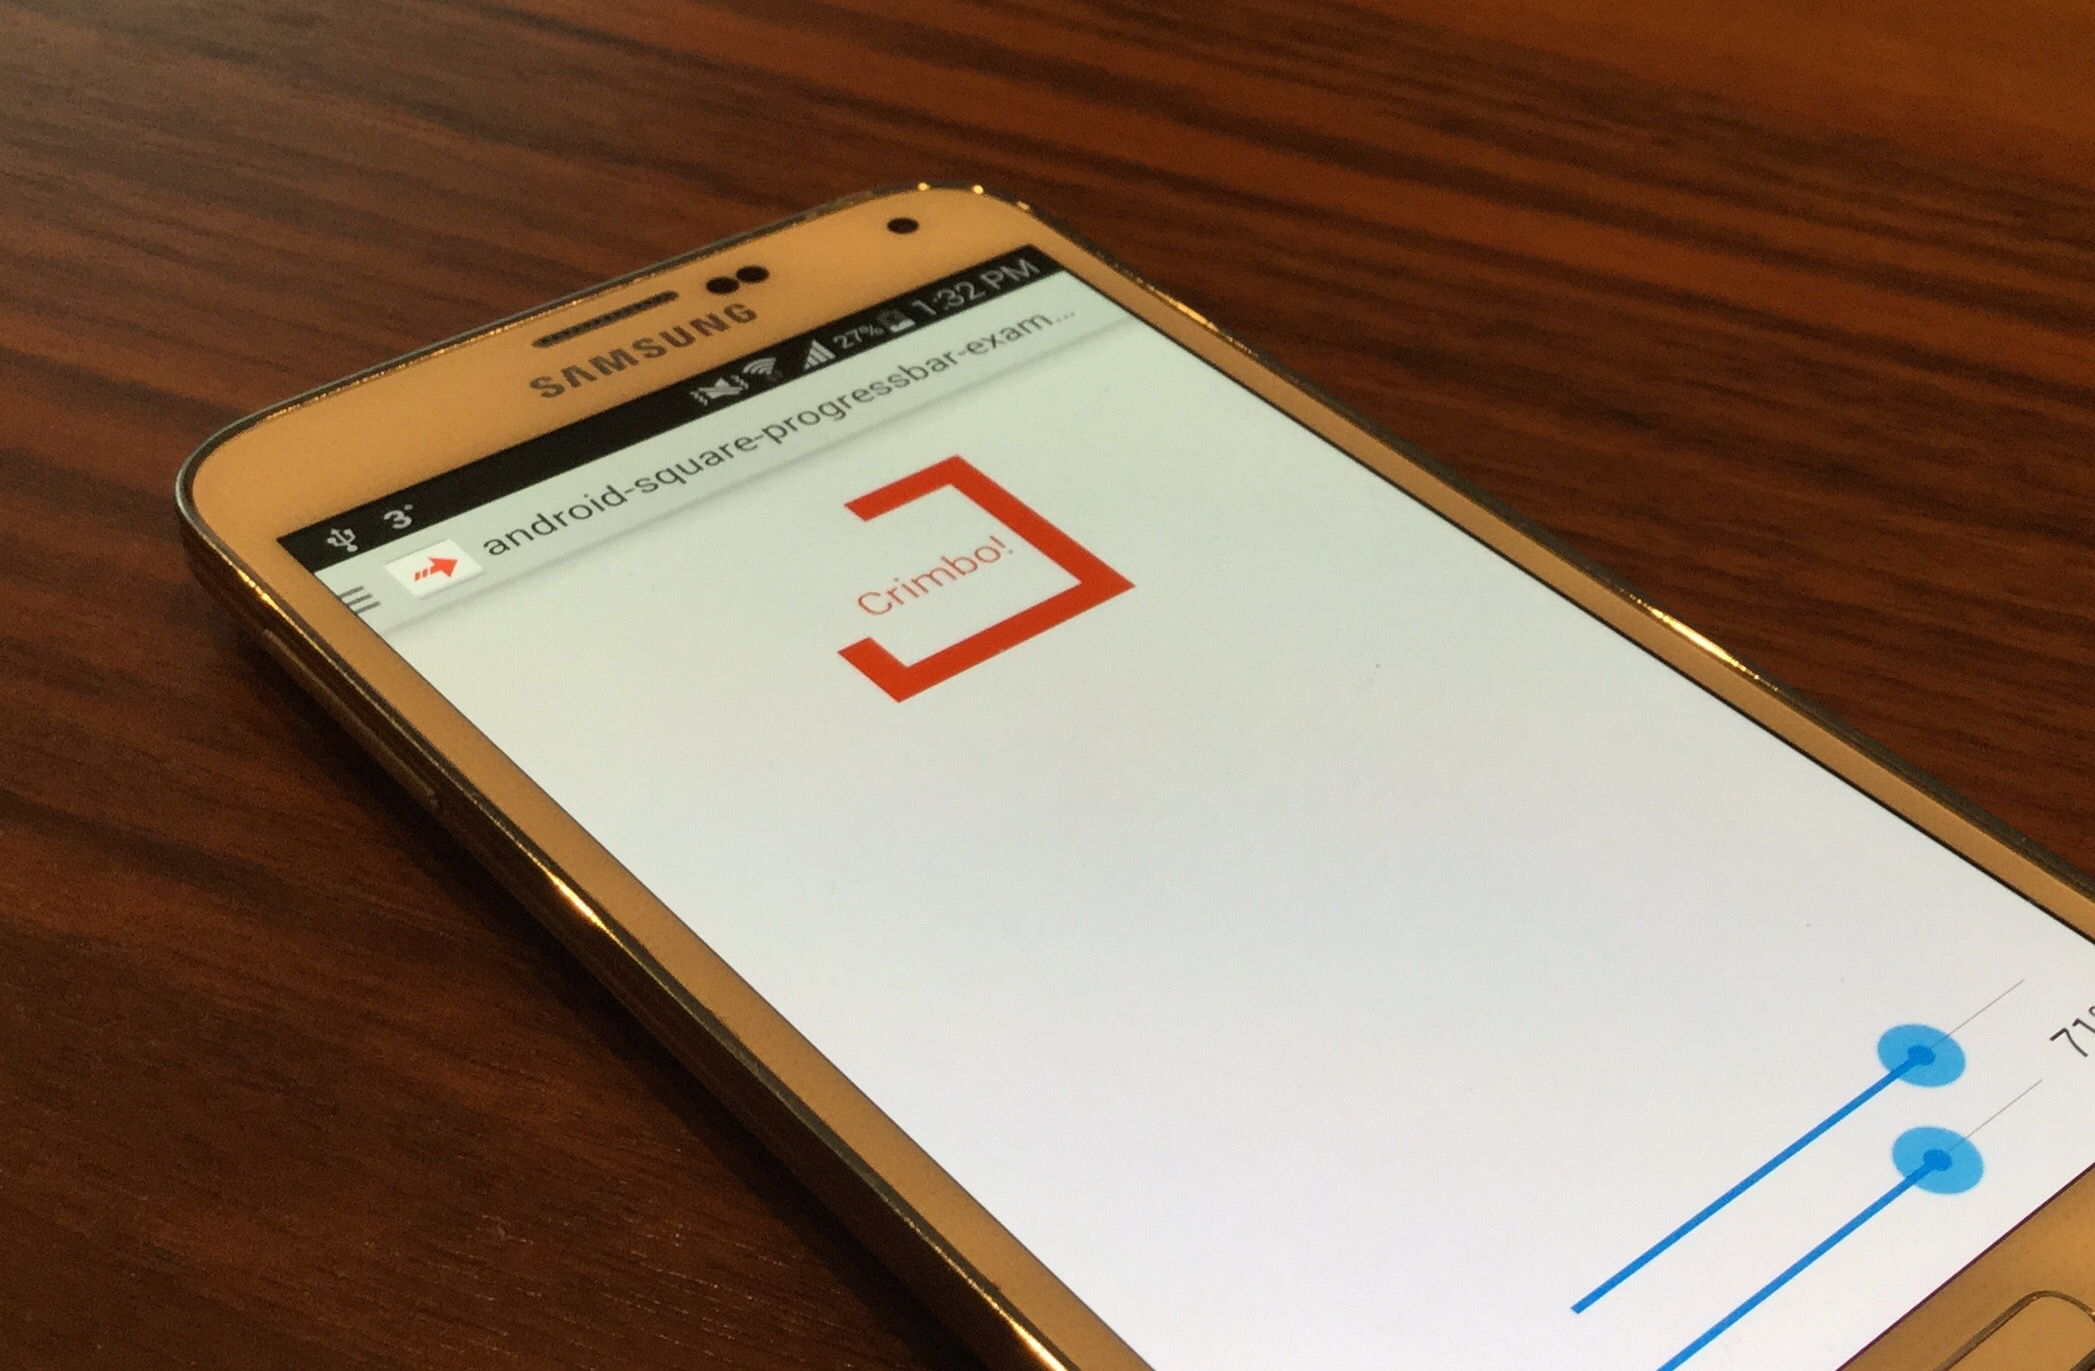 android-square-progressbar v.1.4.1